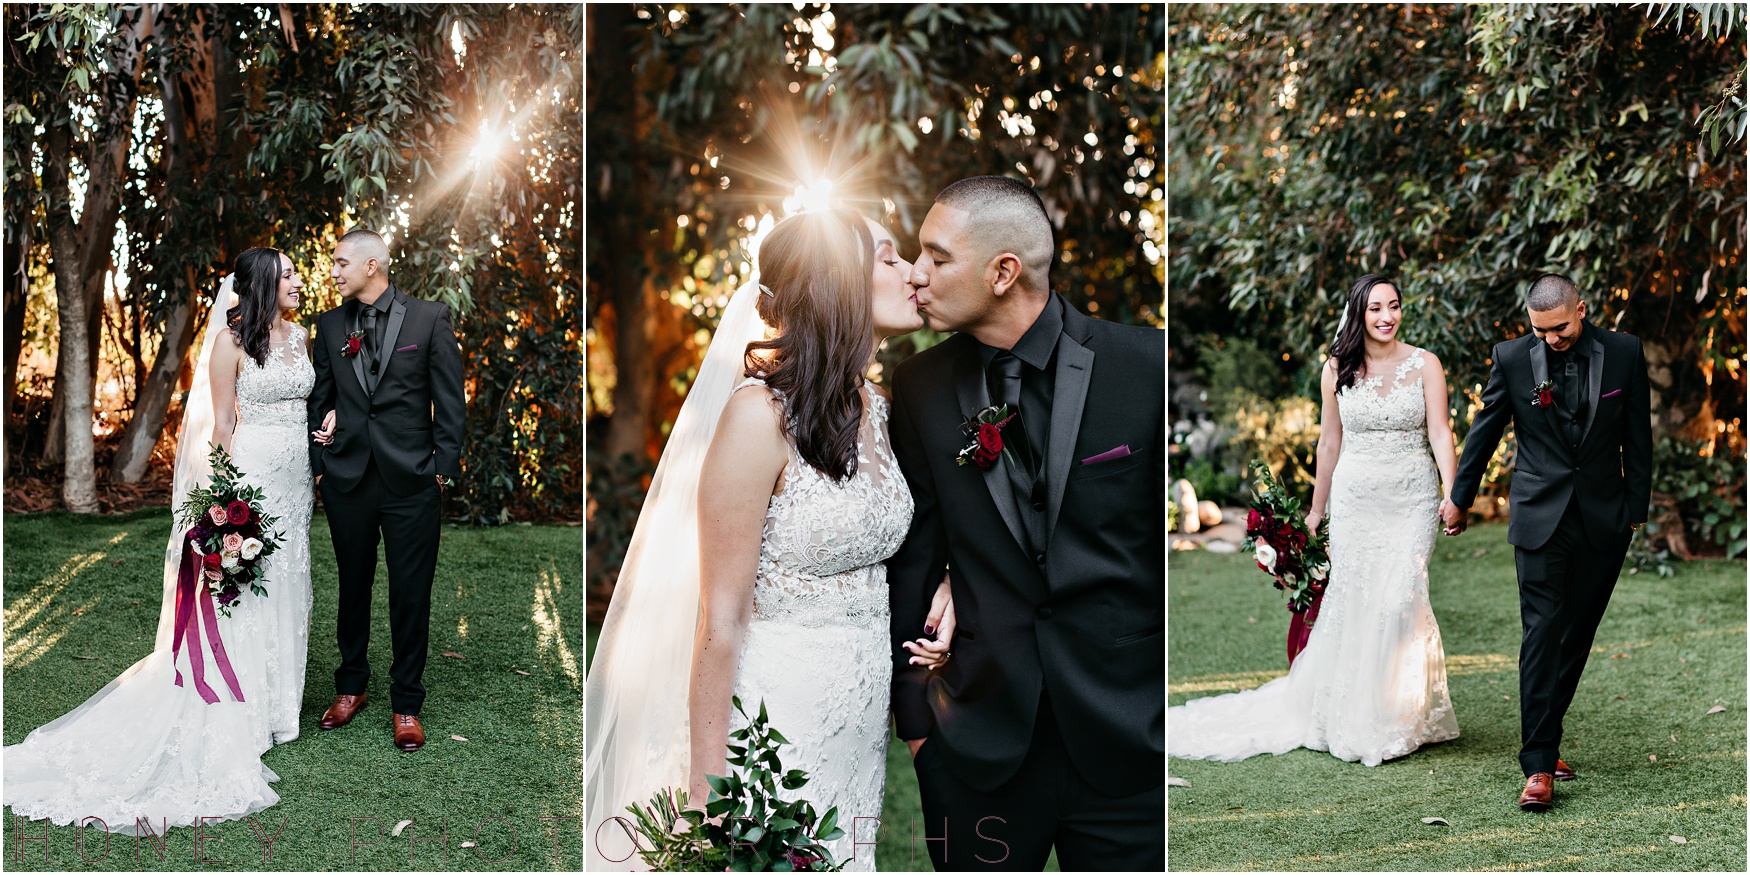 twin_oaks_garden_estate_fall_winter_burgundy_wedding039.jpg